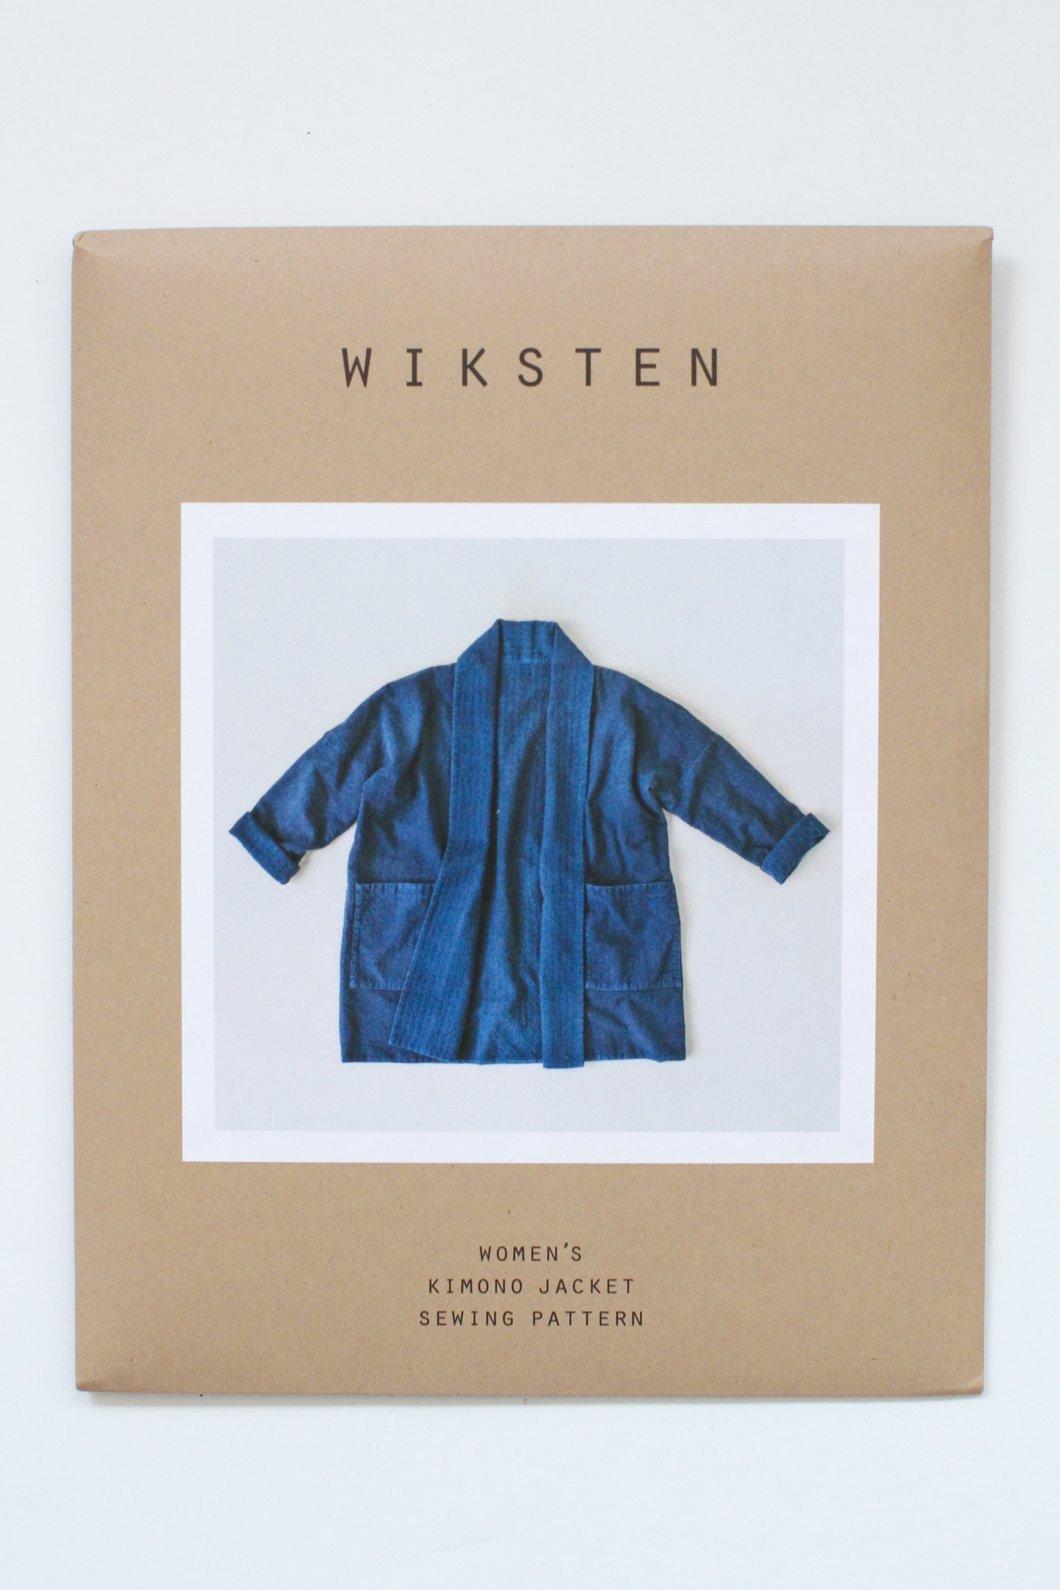 Wiksten - Womens Kimono Jacket